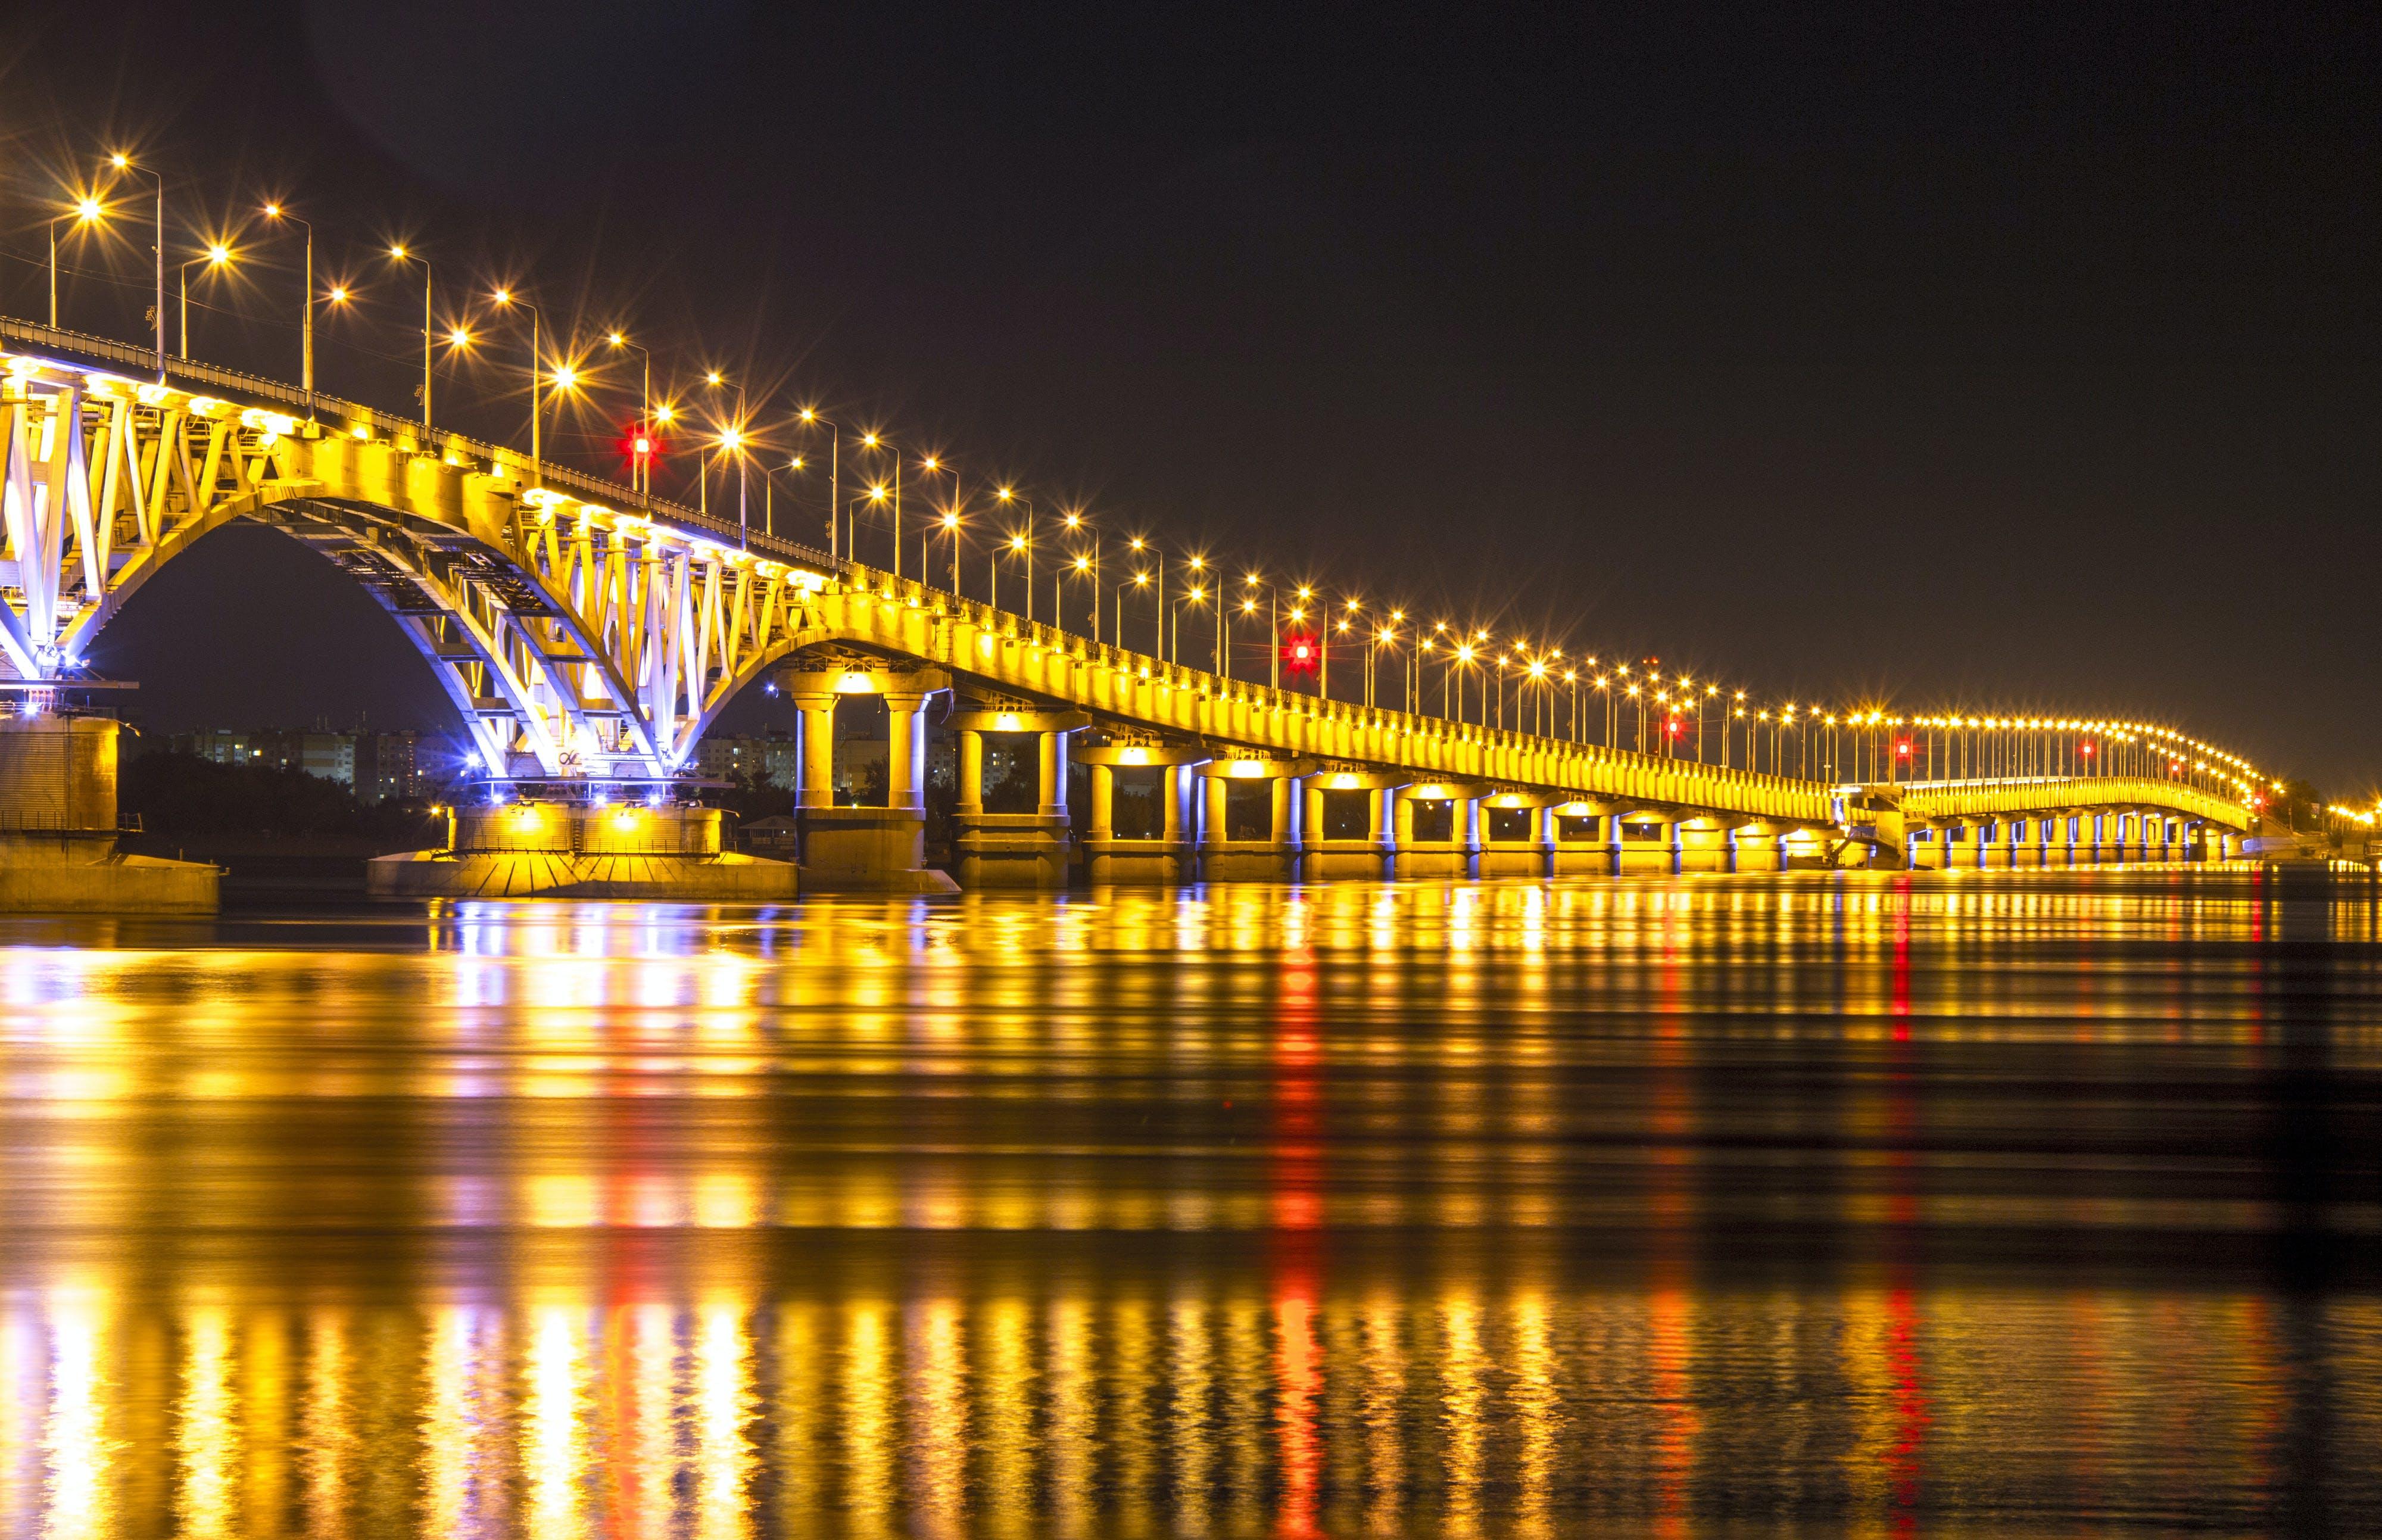 Free stock photo of bridge, city, free images, free photo